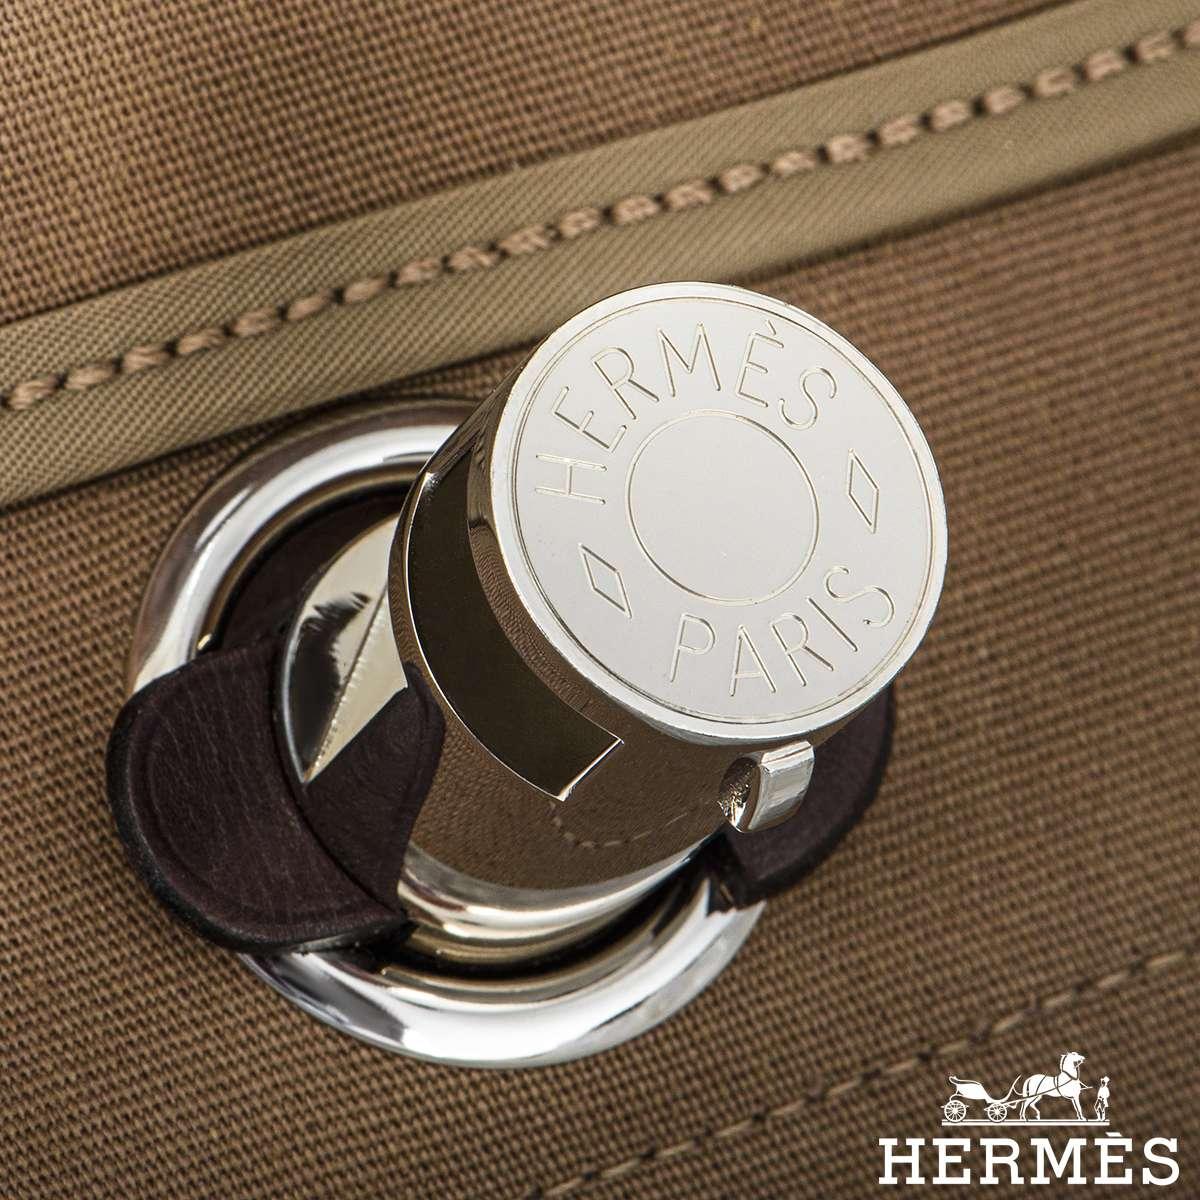 Hermès Herbag Zip Retourne Ebene Vache Leather Etoupe Canvas GM